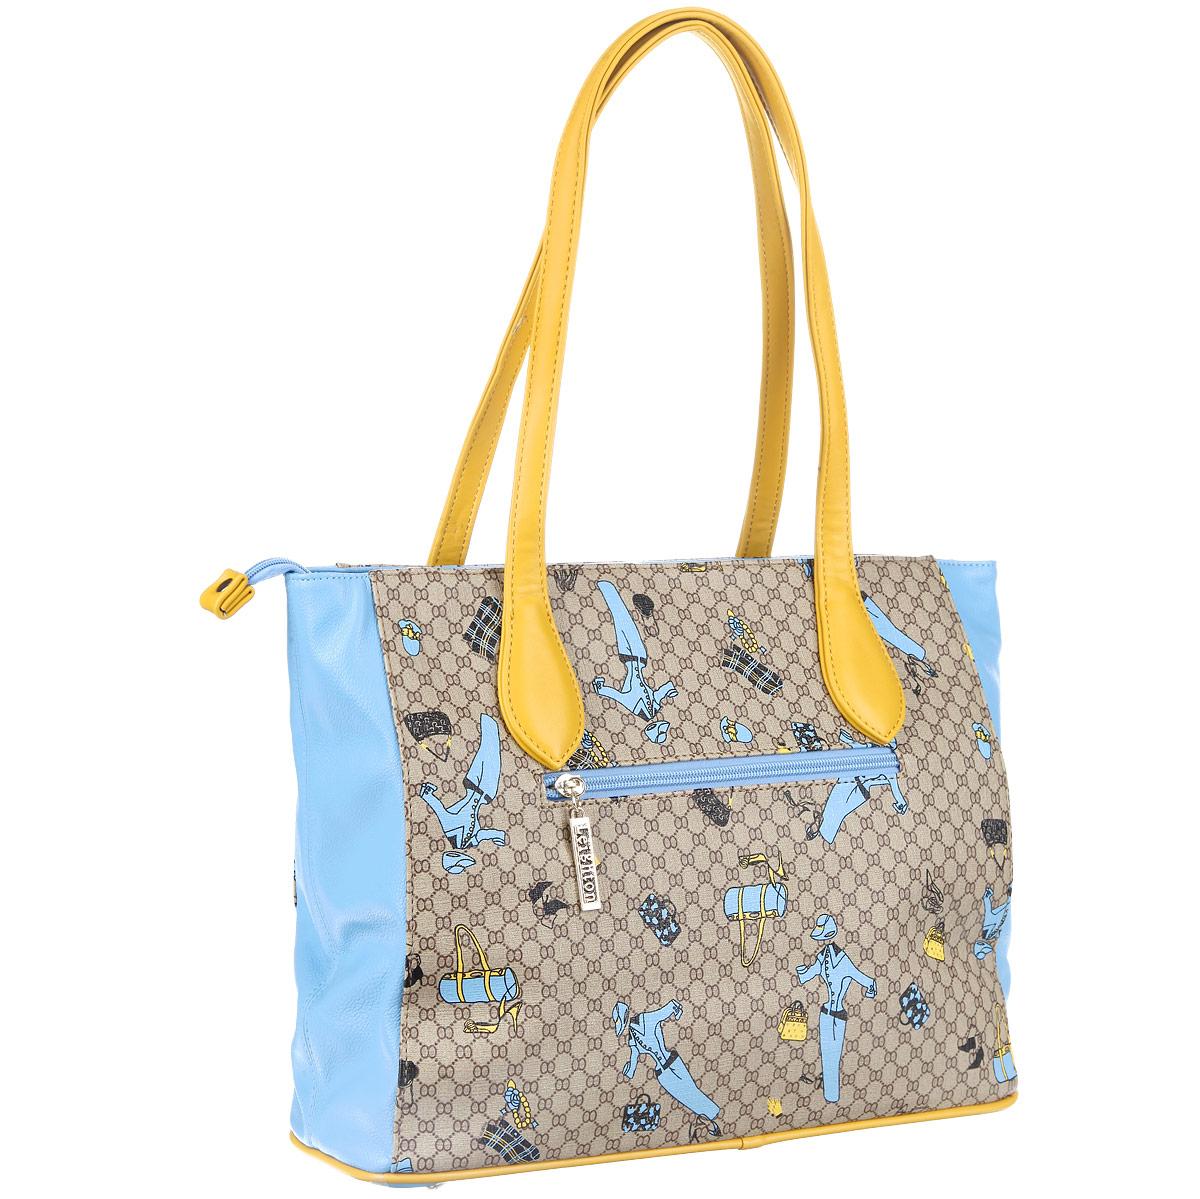 Сумка женская Leighton, цвет: бежевый, голубой. 570173-7027/2/1070/703/25 ( 570173-7027/2/1070/703/25 )